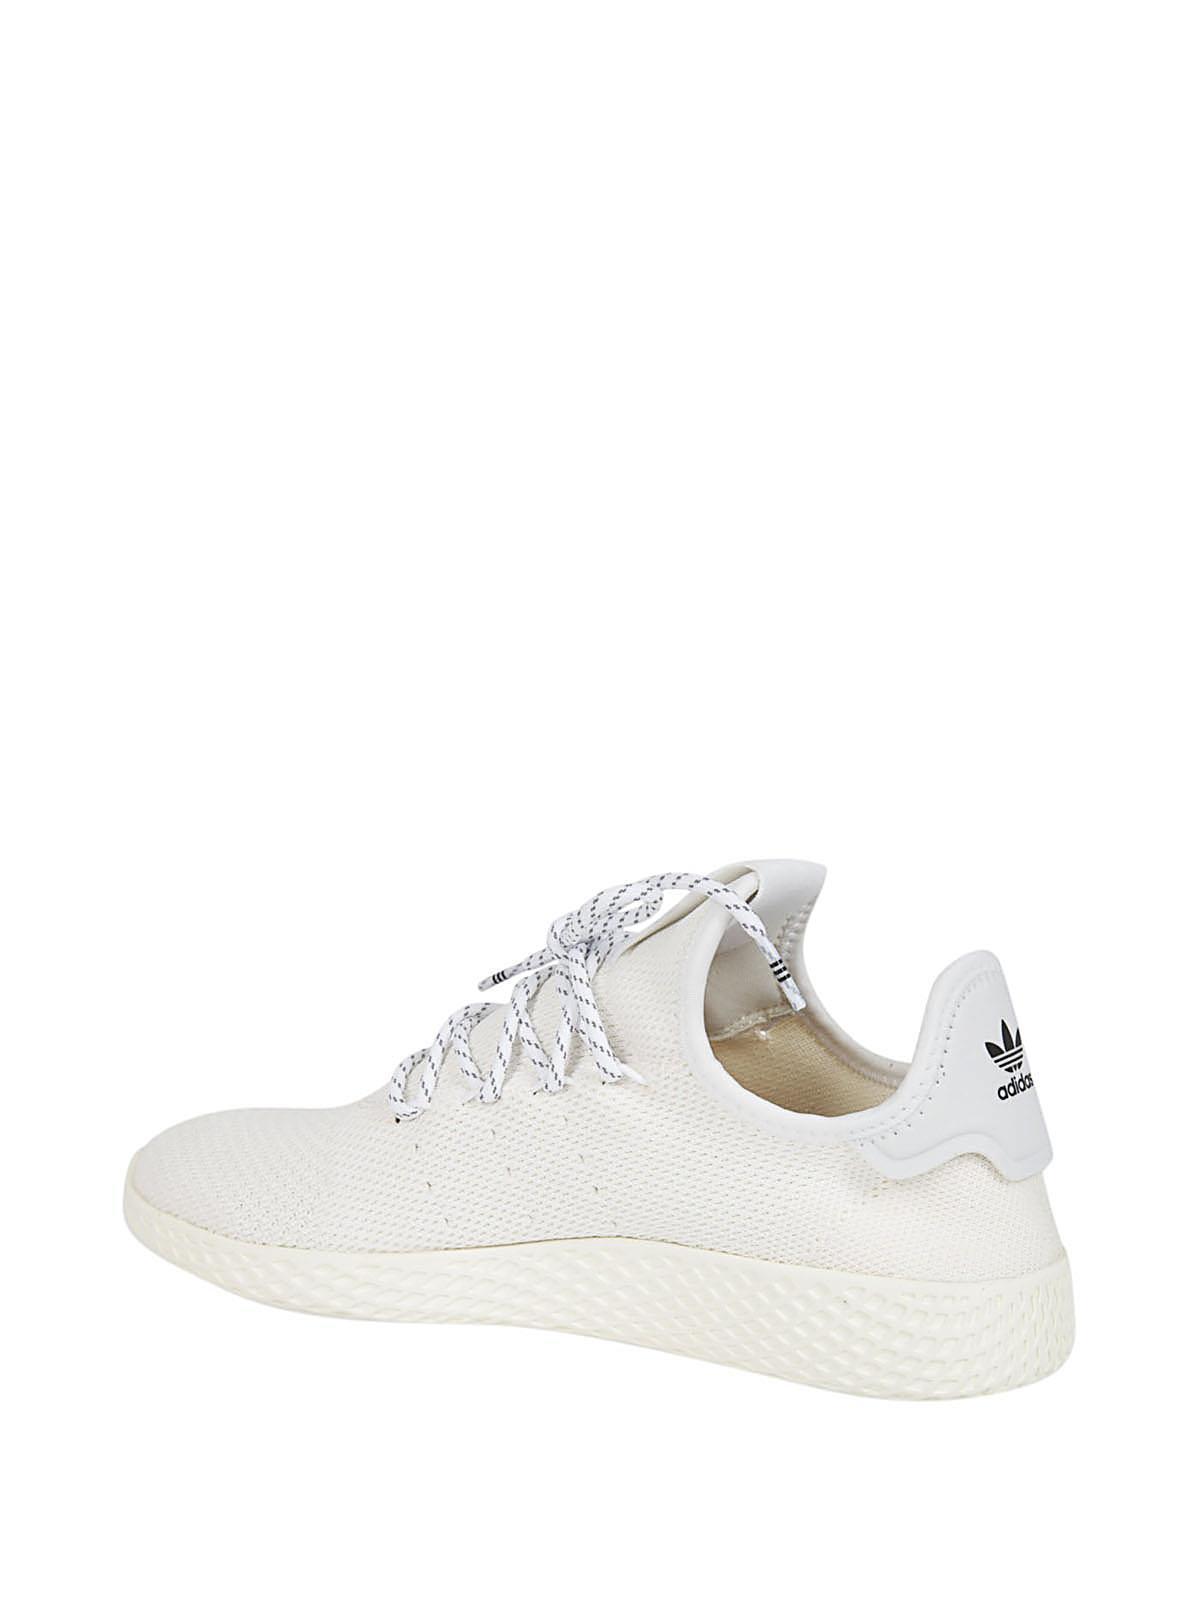 big sale 62e30 788bf Lyst - adidas Originals ADIDAS BY PHARRELL WILLIAMS Sneaker pw hu ...